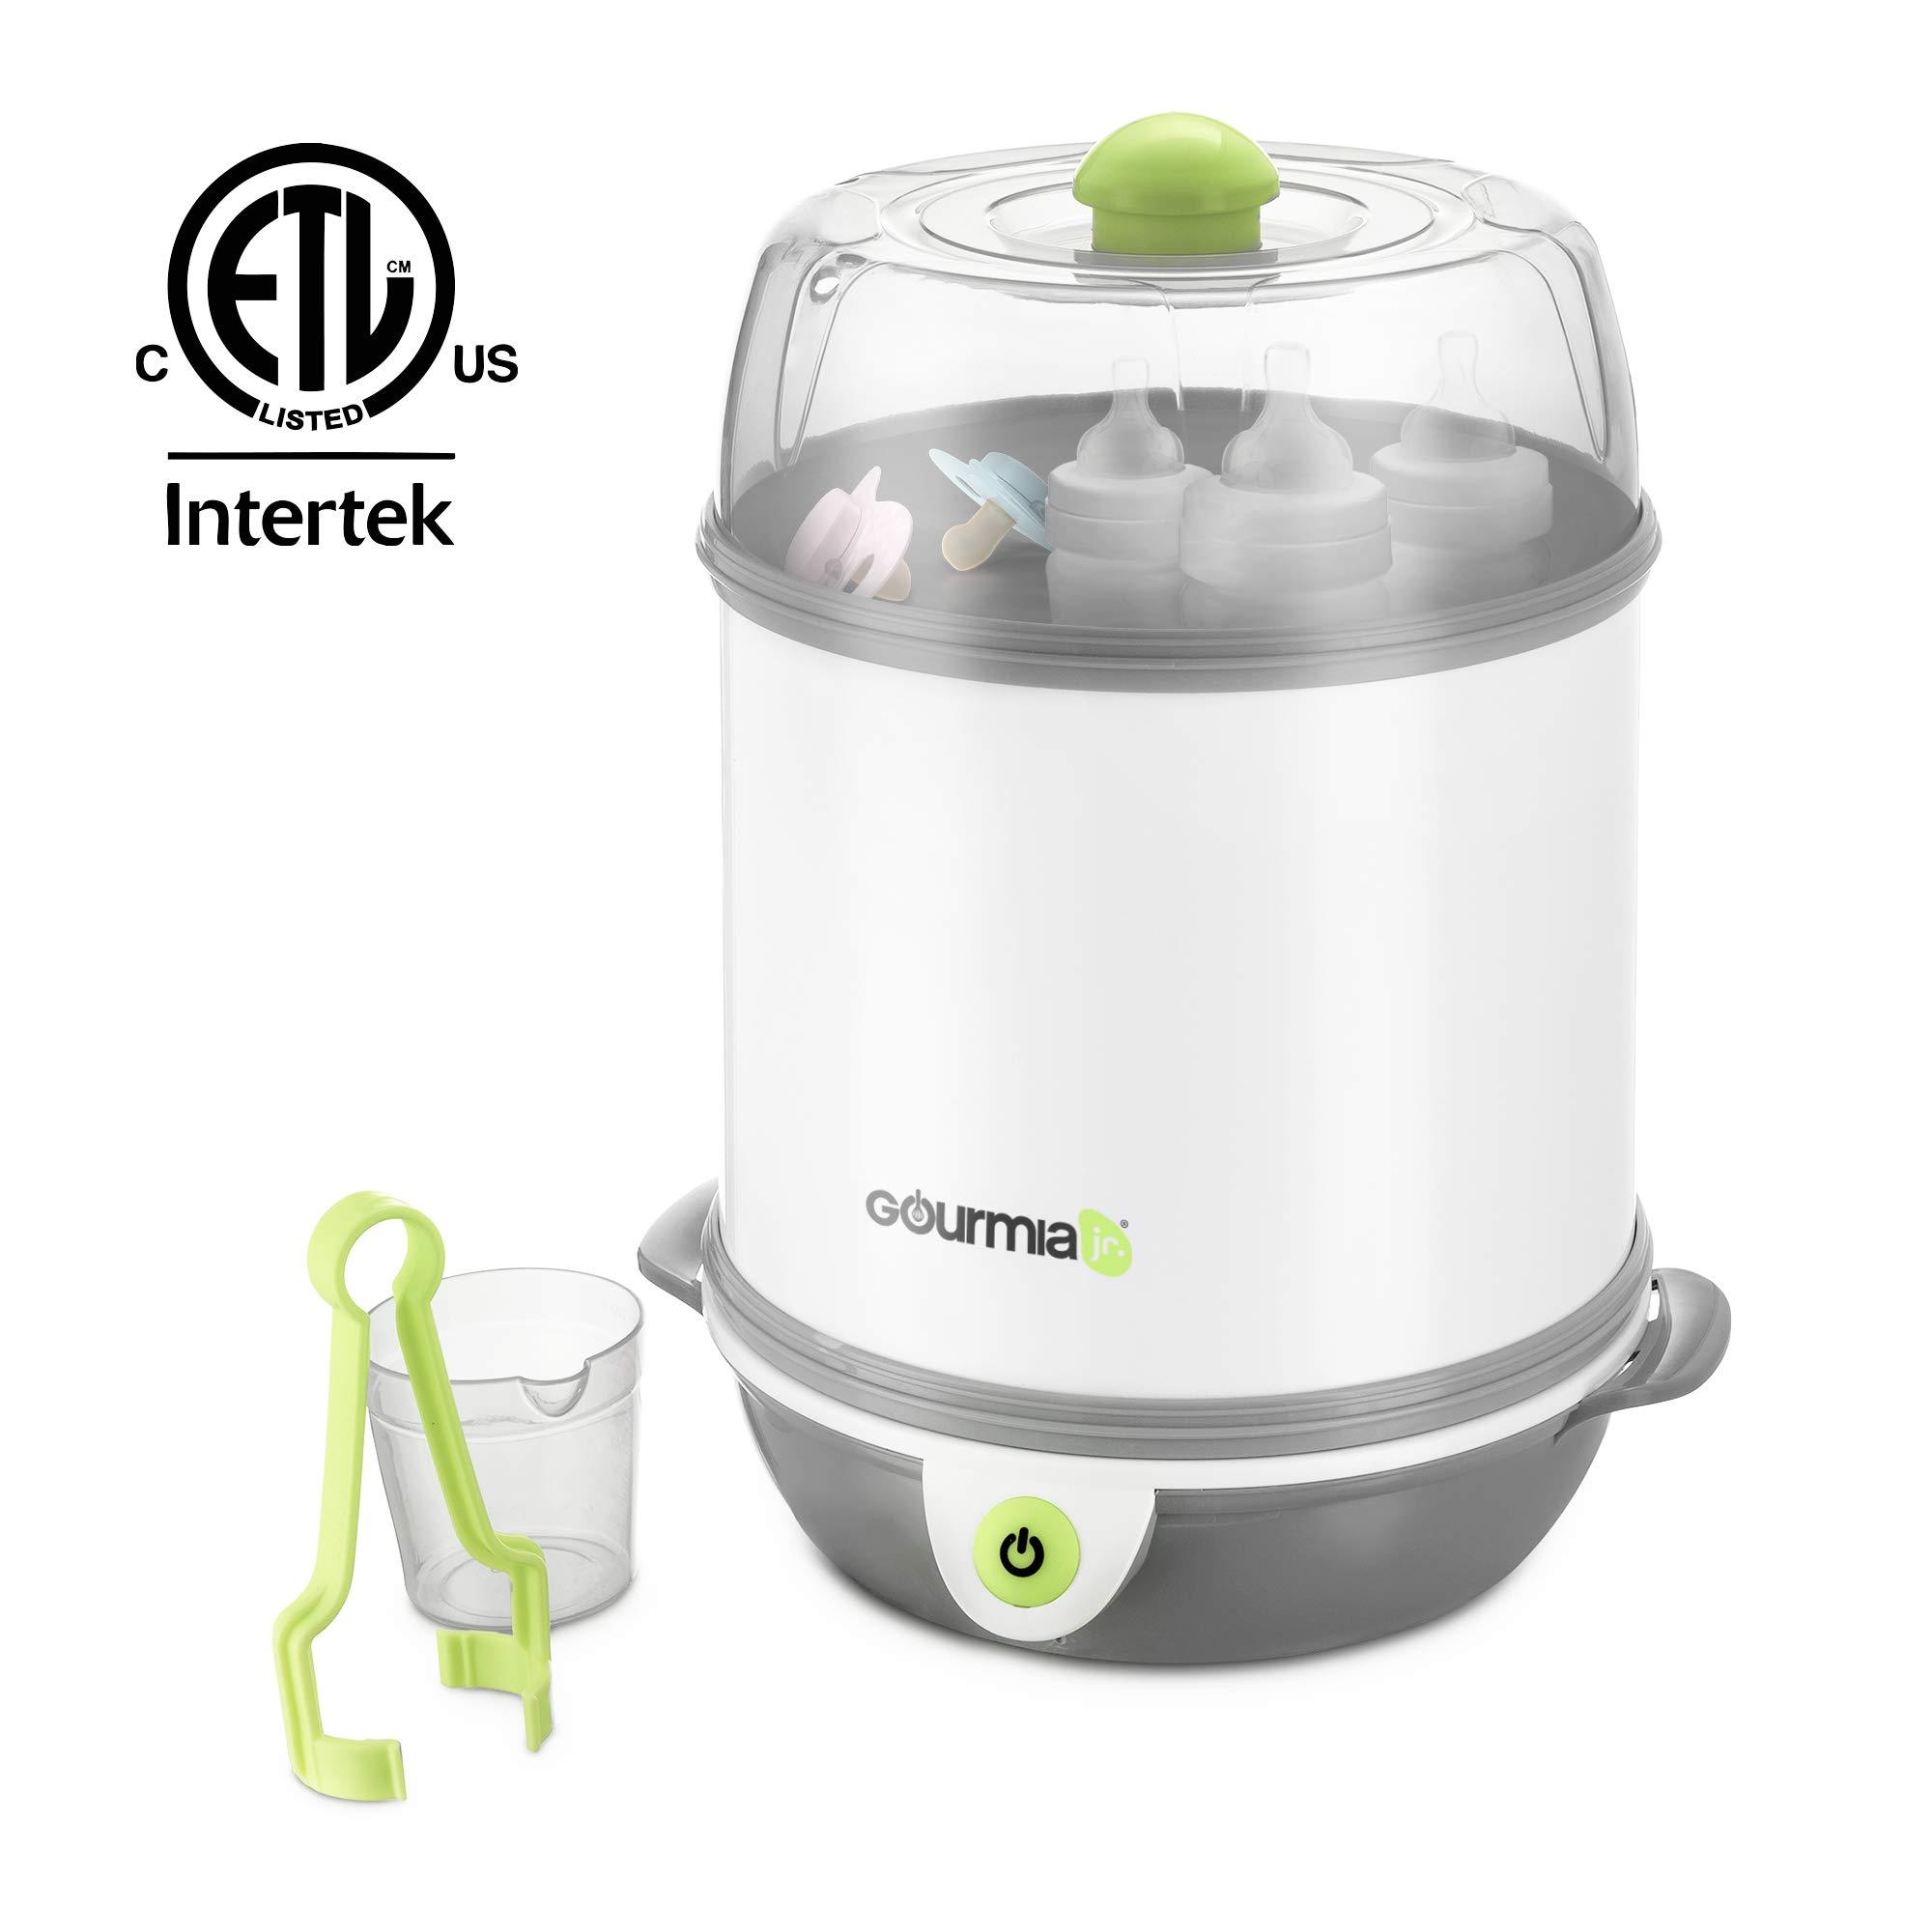 Gourmia Jr. Baby Bottle Sterilizer, 7-Bottle Sterilizing Chamber, Single-Button Operation, Stainless Steel Heating Plate, Dishwasher-Safe Removable Parts, JBS100, ETL-Certified